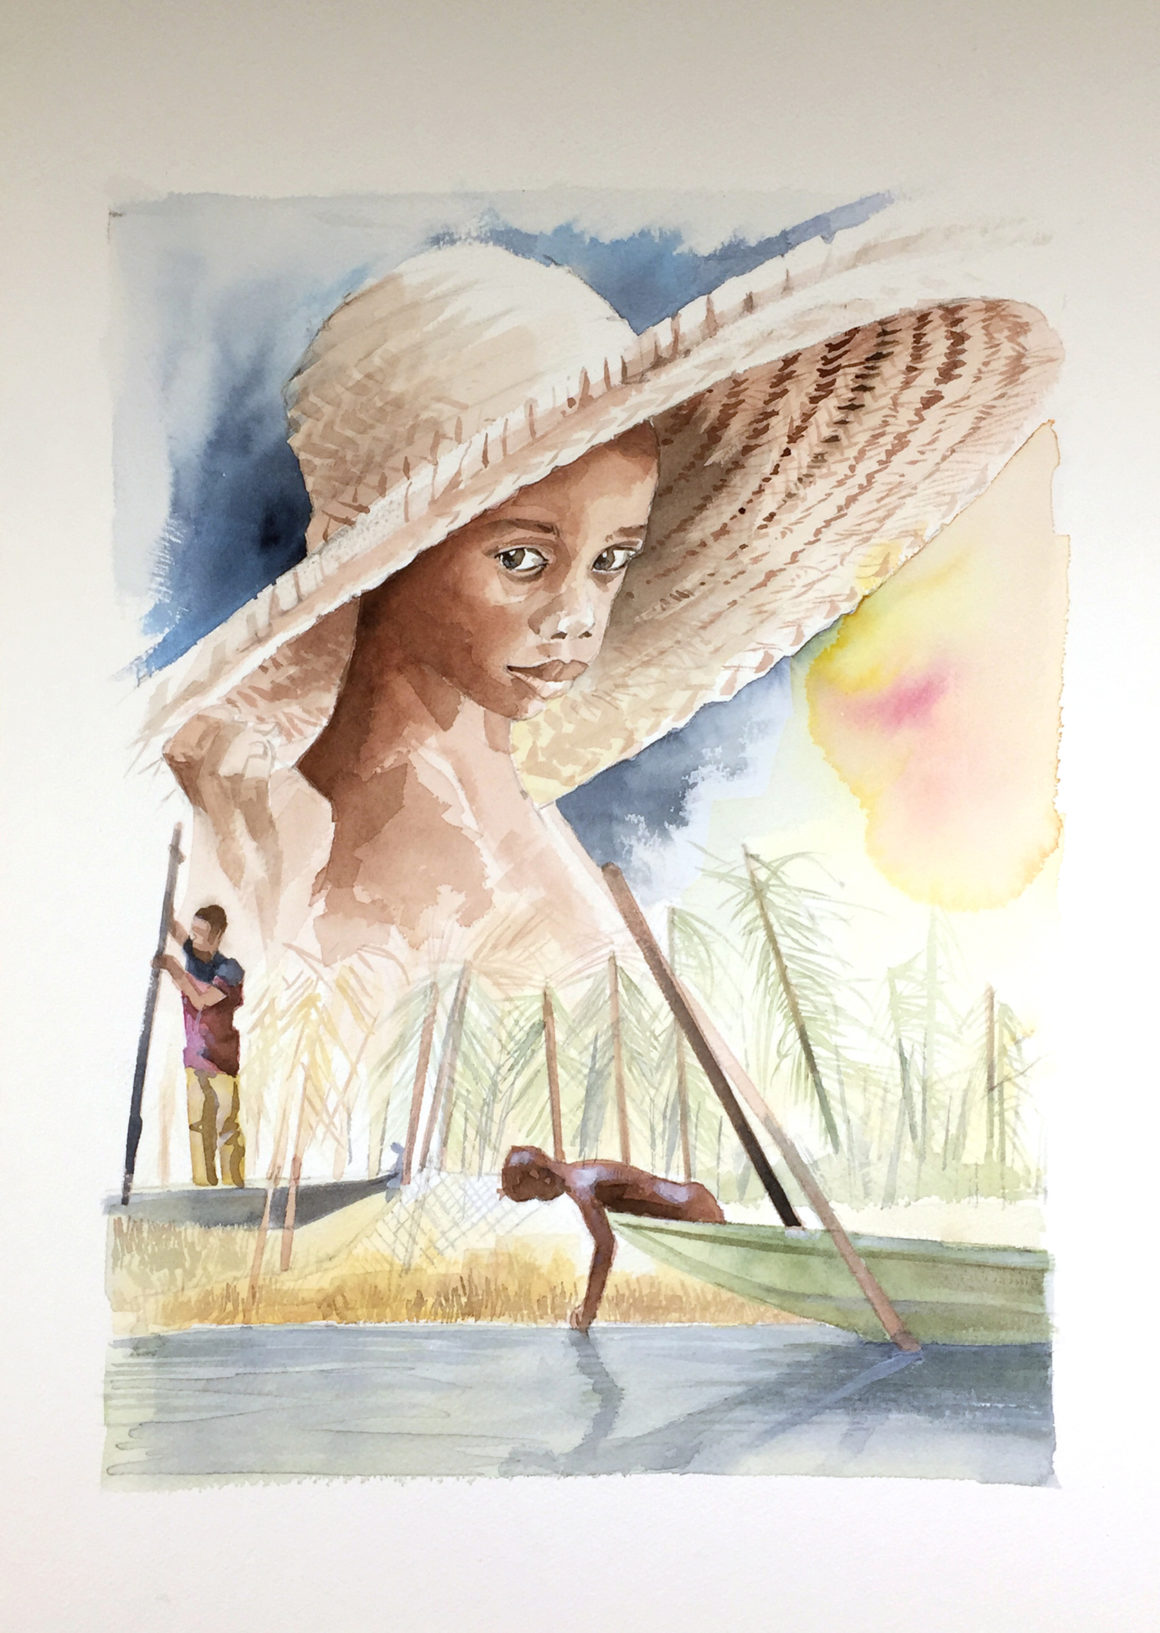 005 Vito Lentini Designer Acquarelli Children and fishermen_35x50